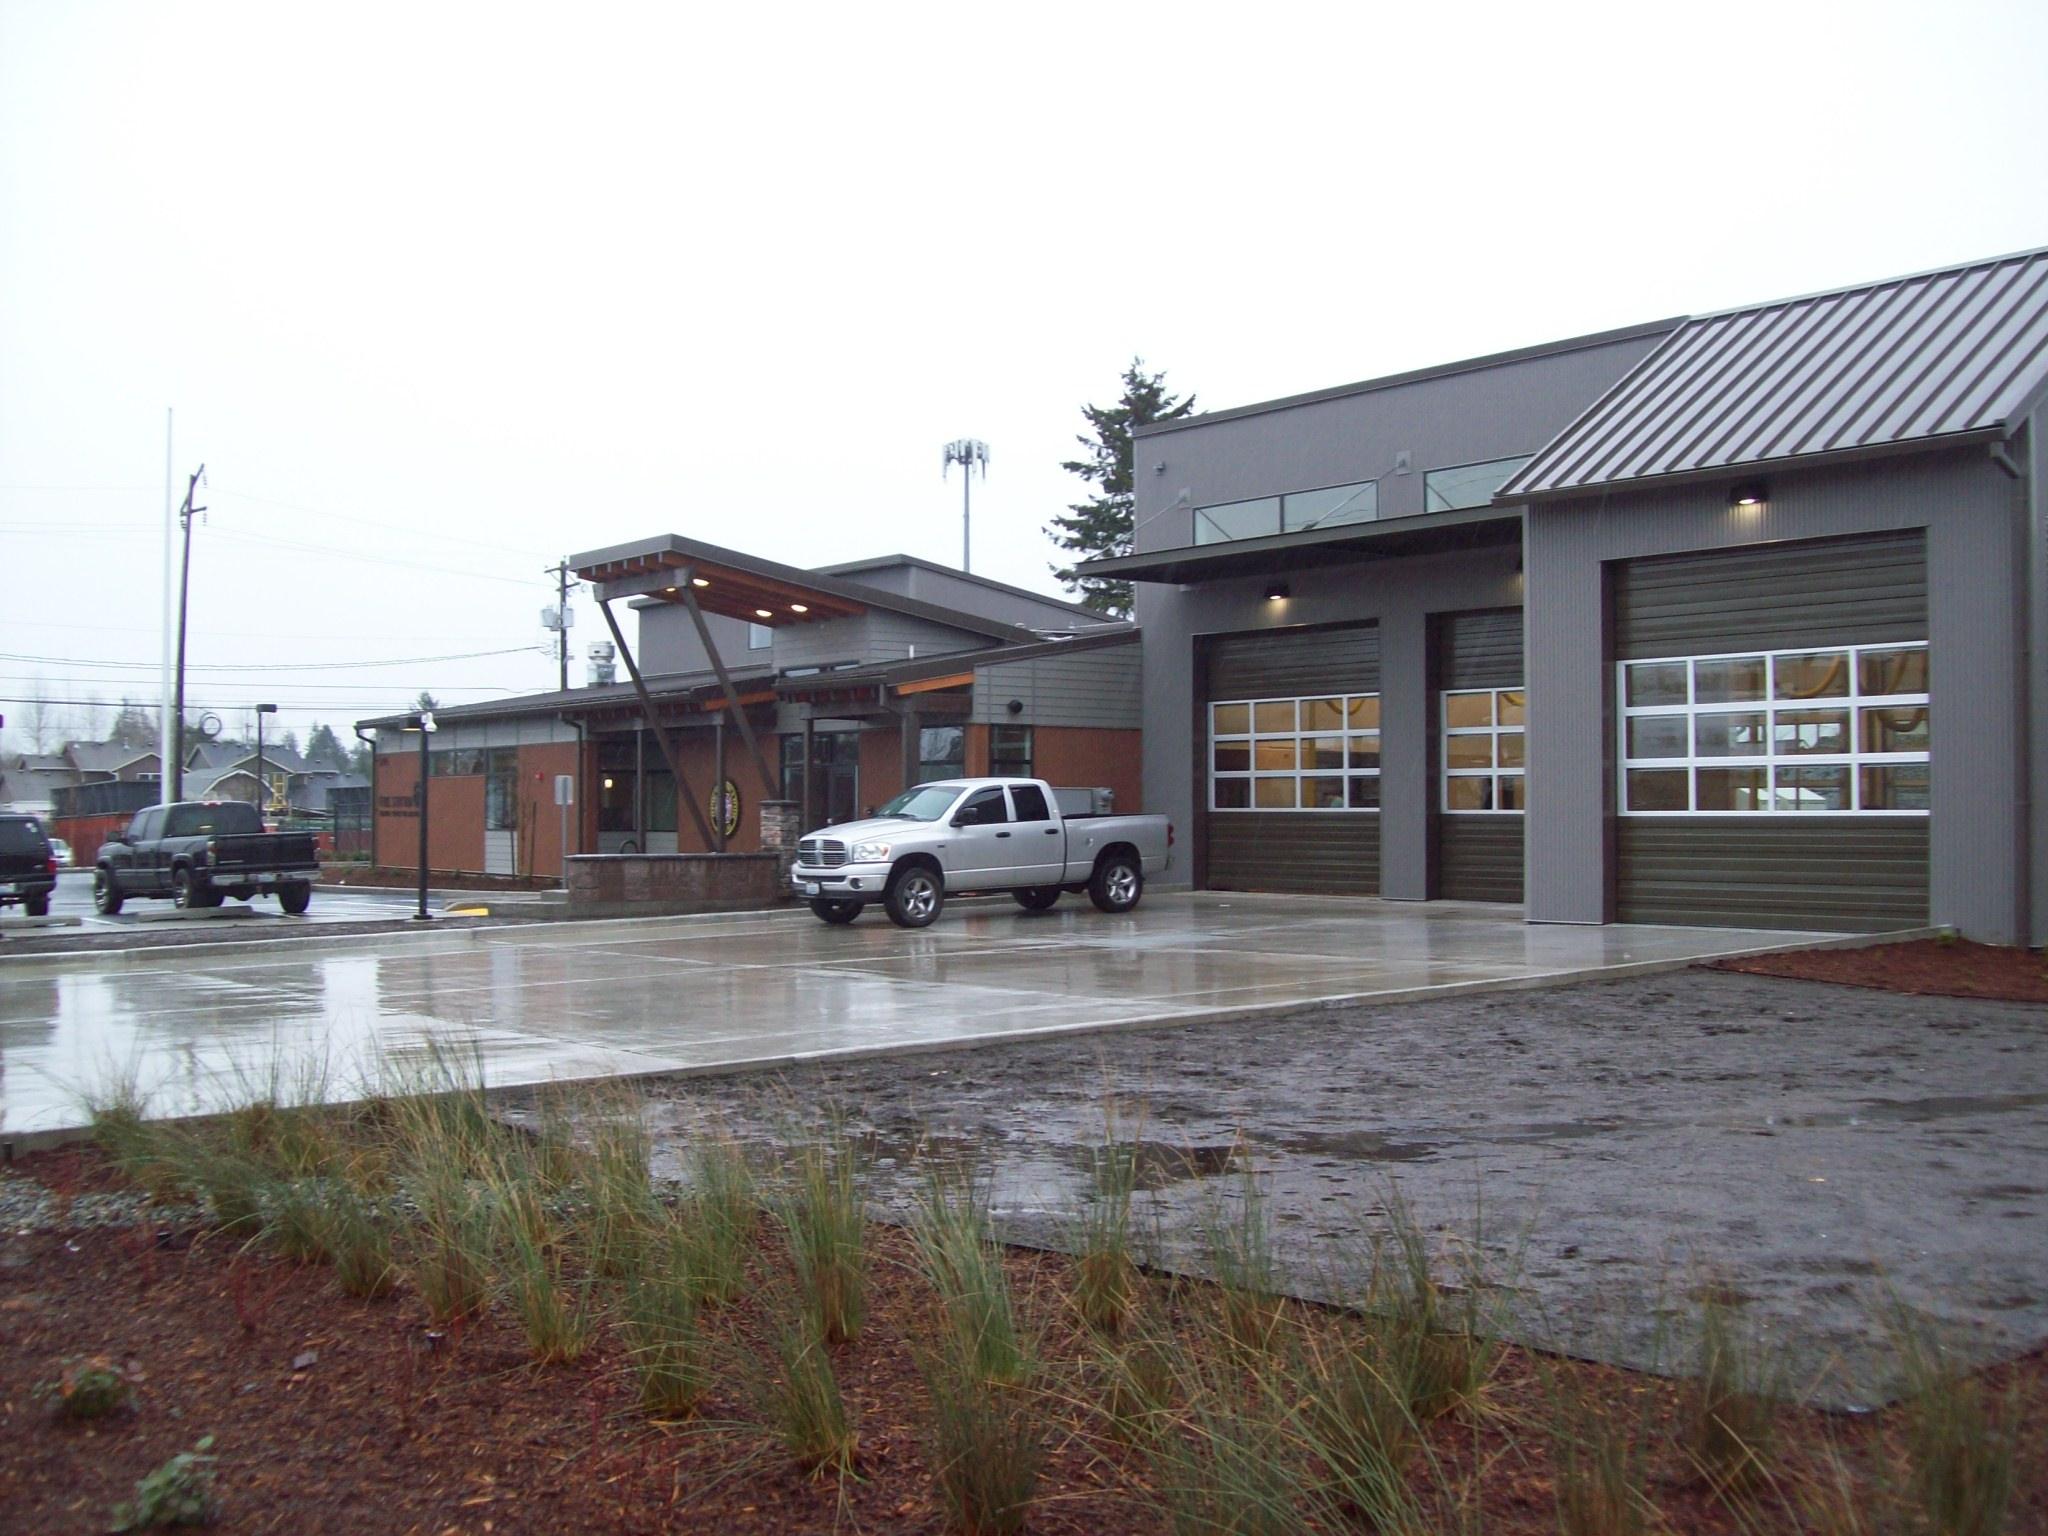 1604.1 - Fire Station 63, Tacoma